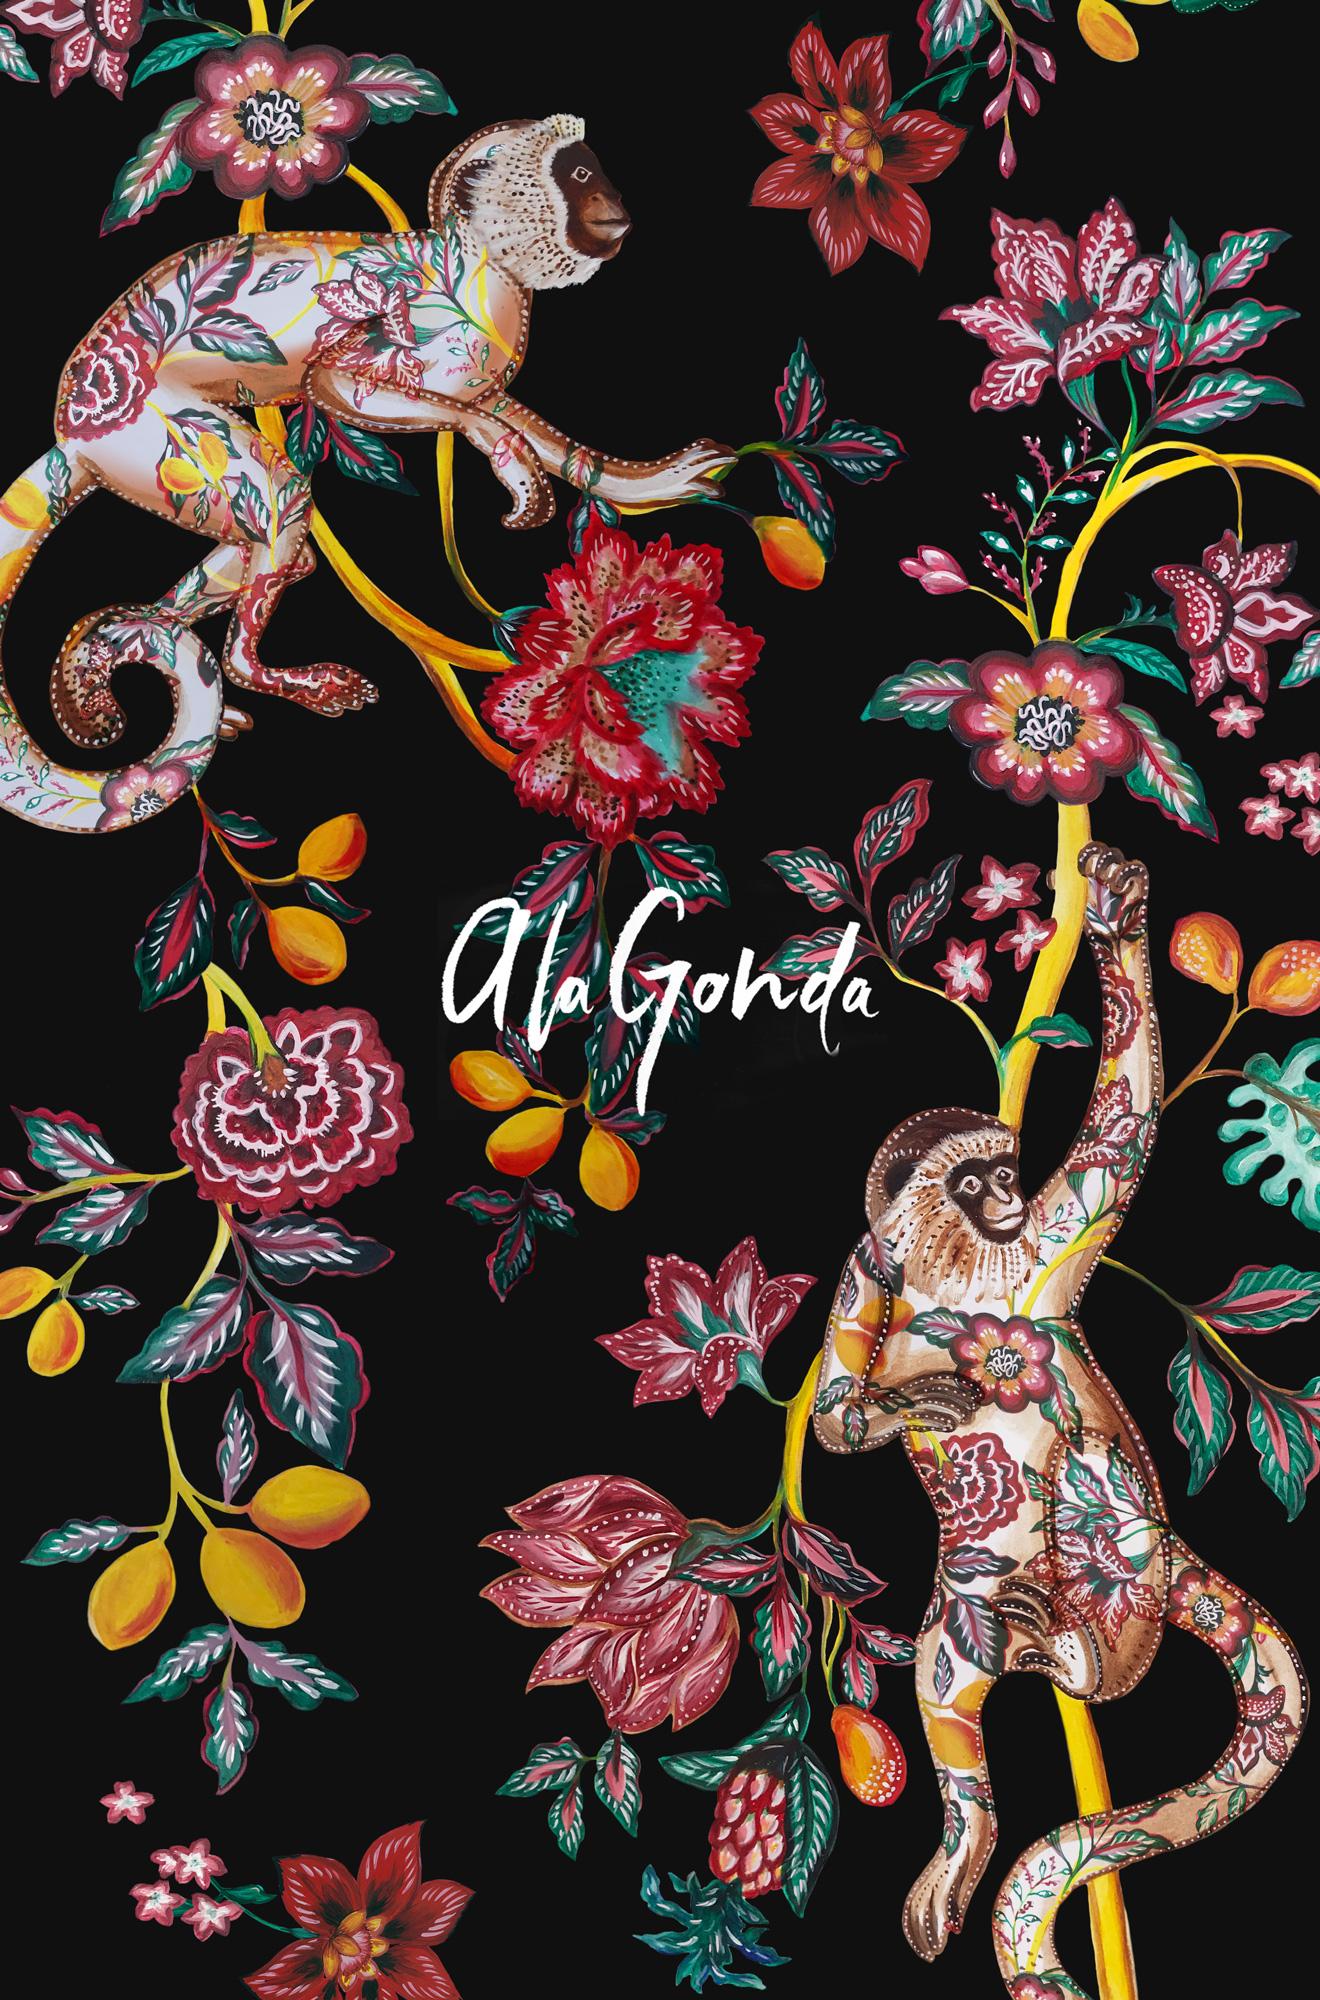 jungle-monkeys-alagonda-designs-3